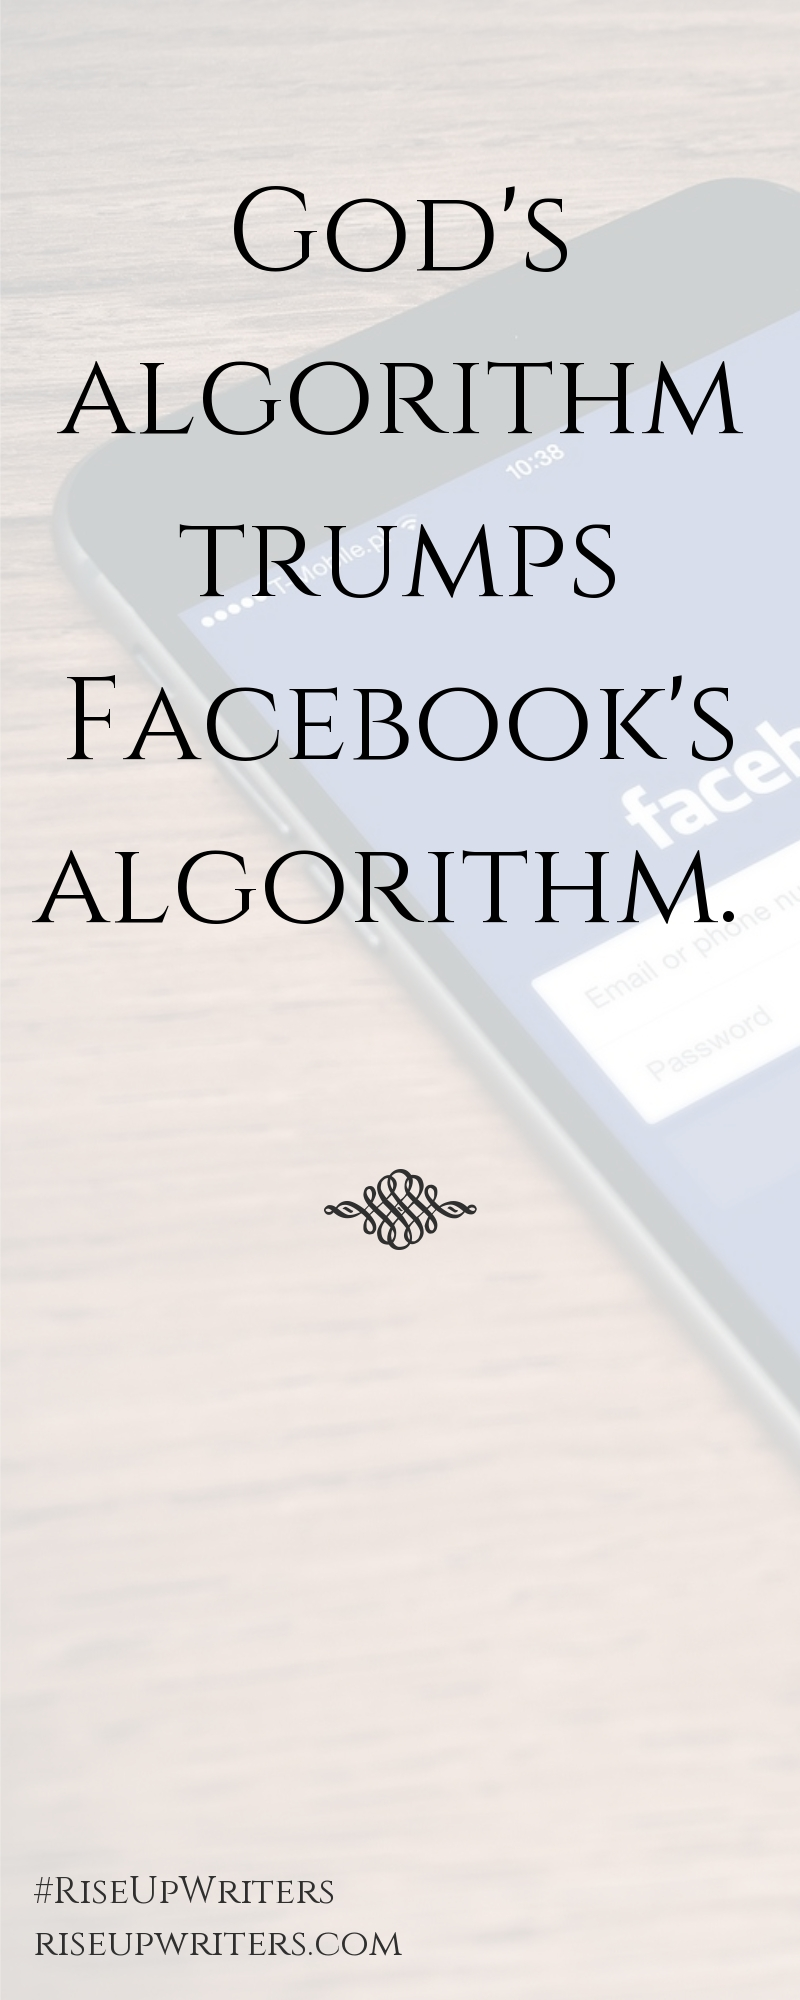 God's Algorithm Trumps Facebook's Algorithm